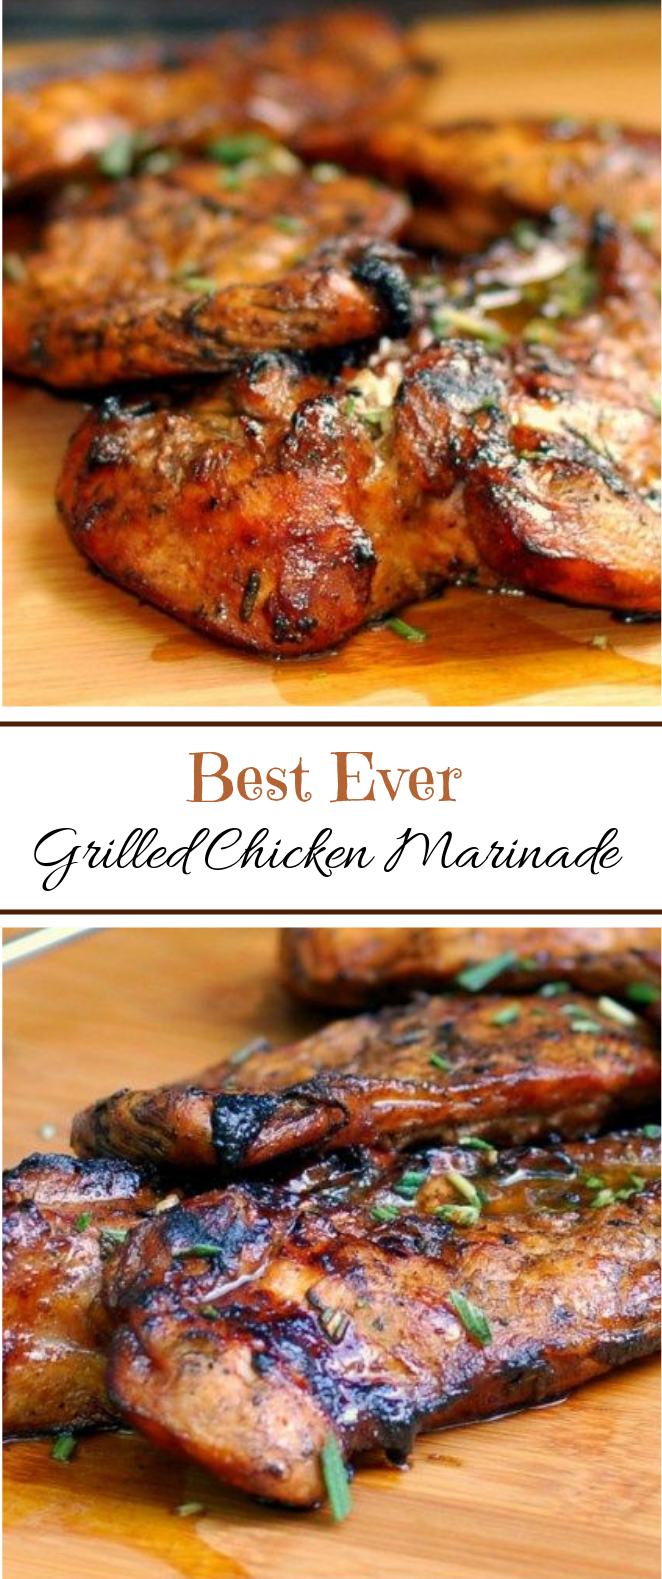 The BEST EVER Grilled Chicken Marinade #Summerrecipe #Grilled